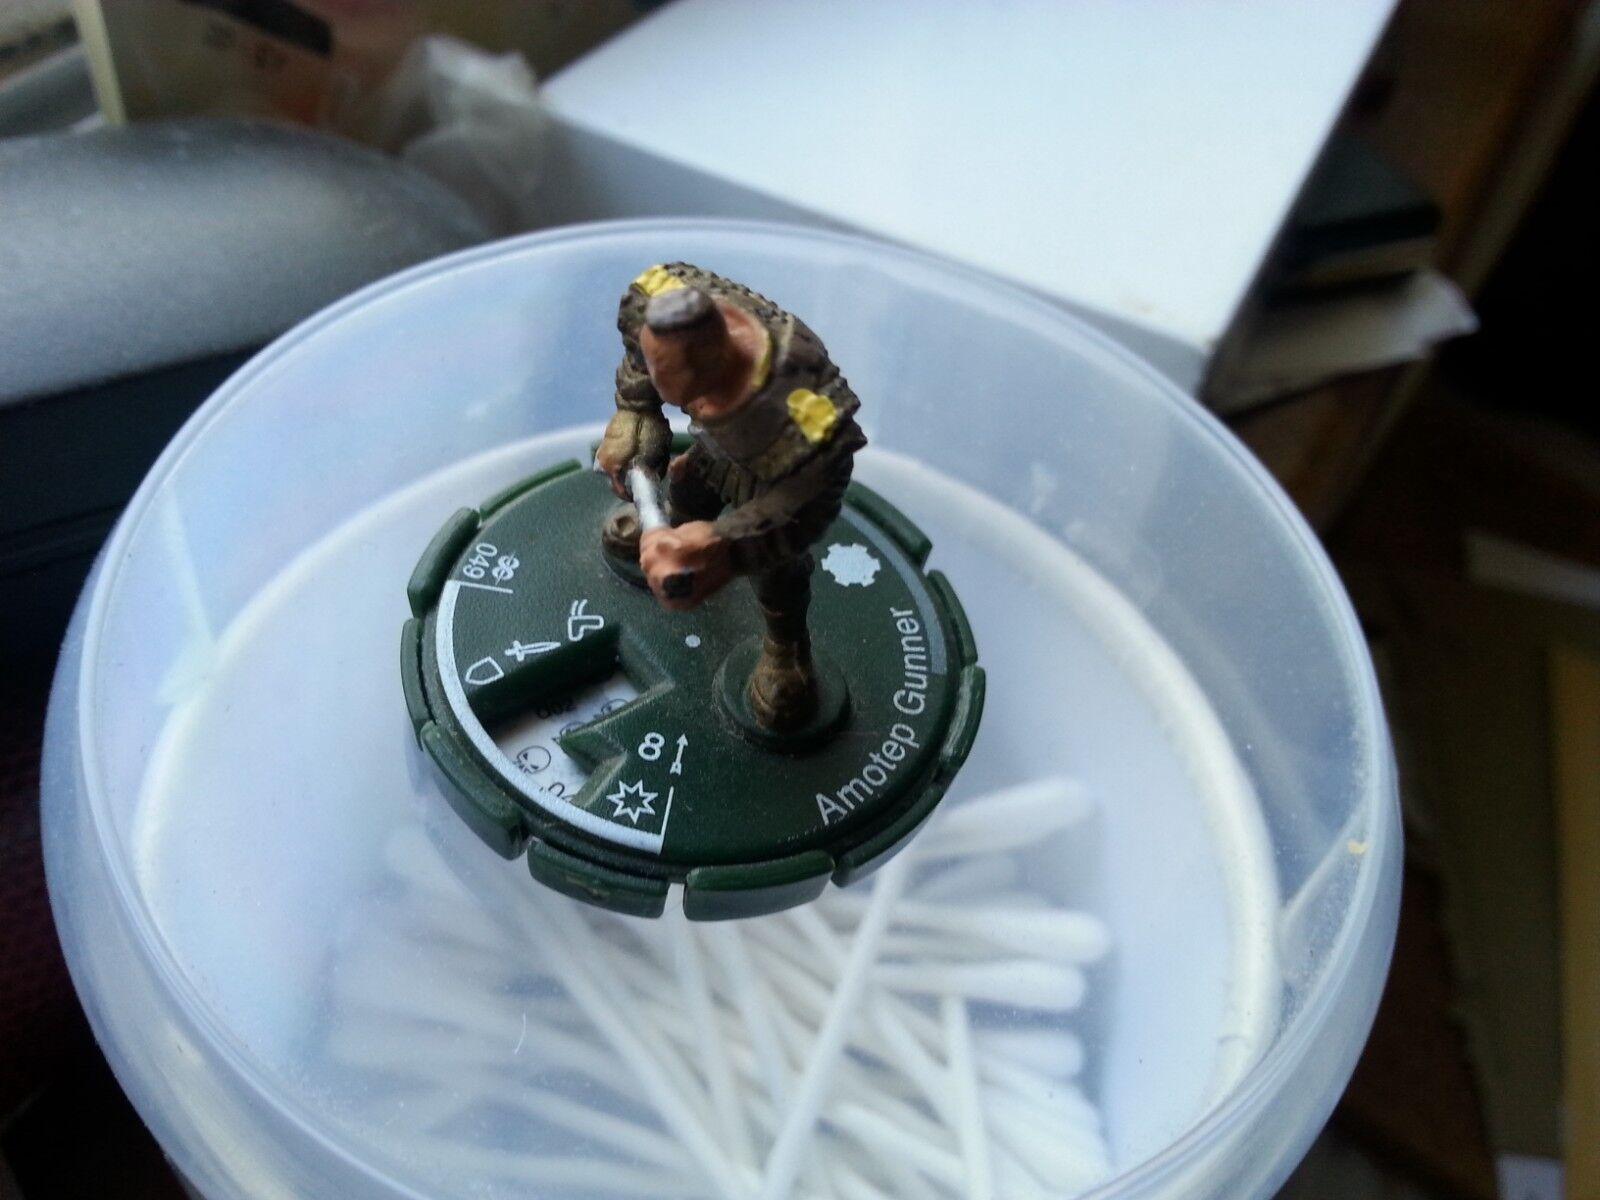 WizKids Heroclix Amotep Gunner Patent Pending Miniature Figure